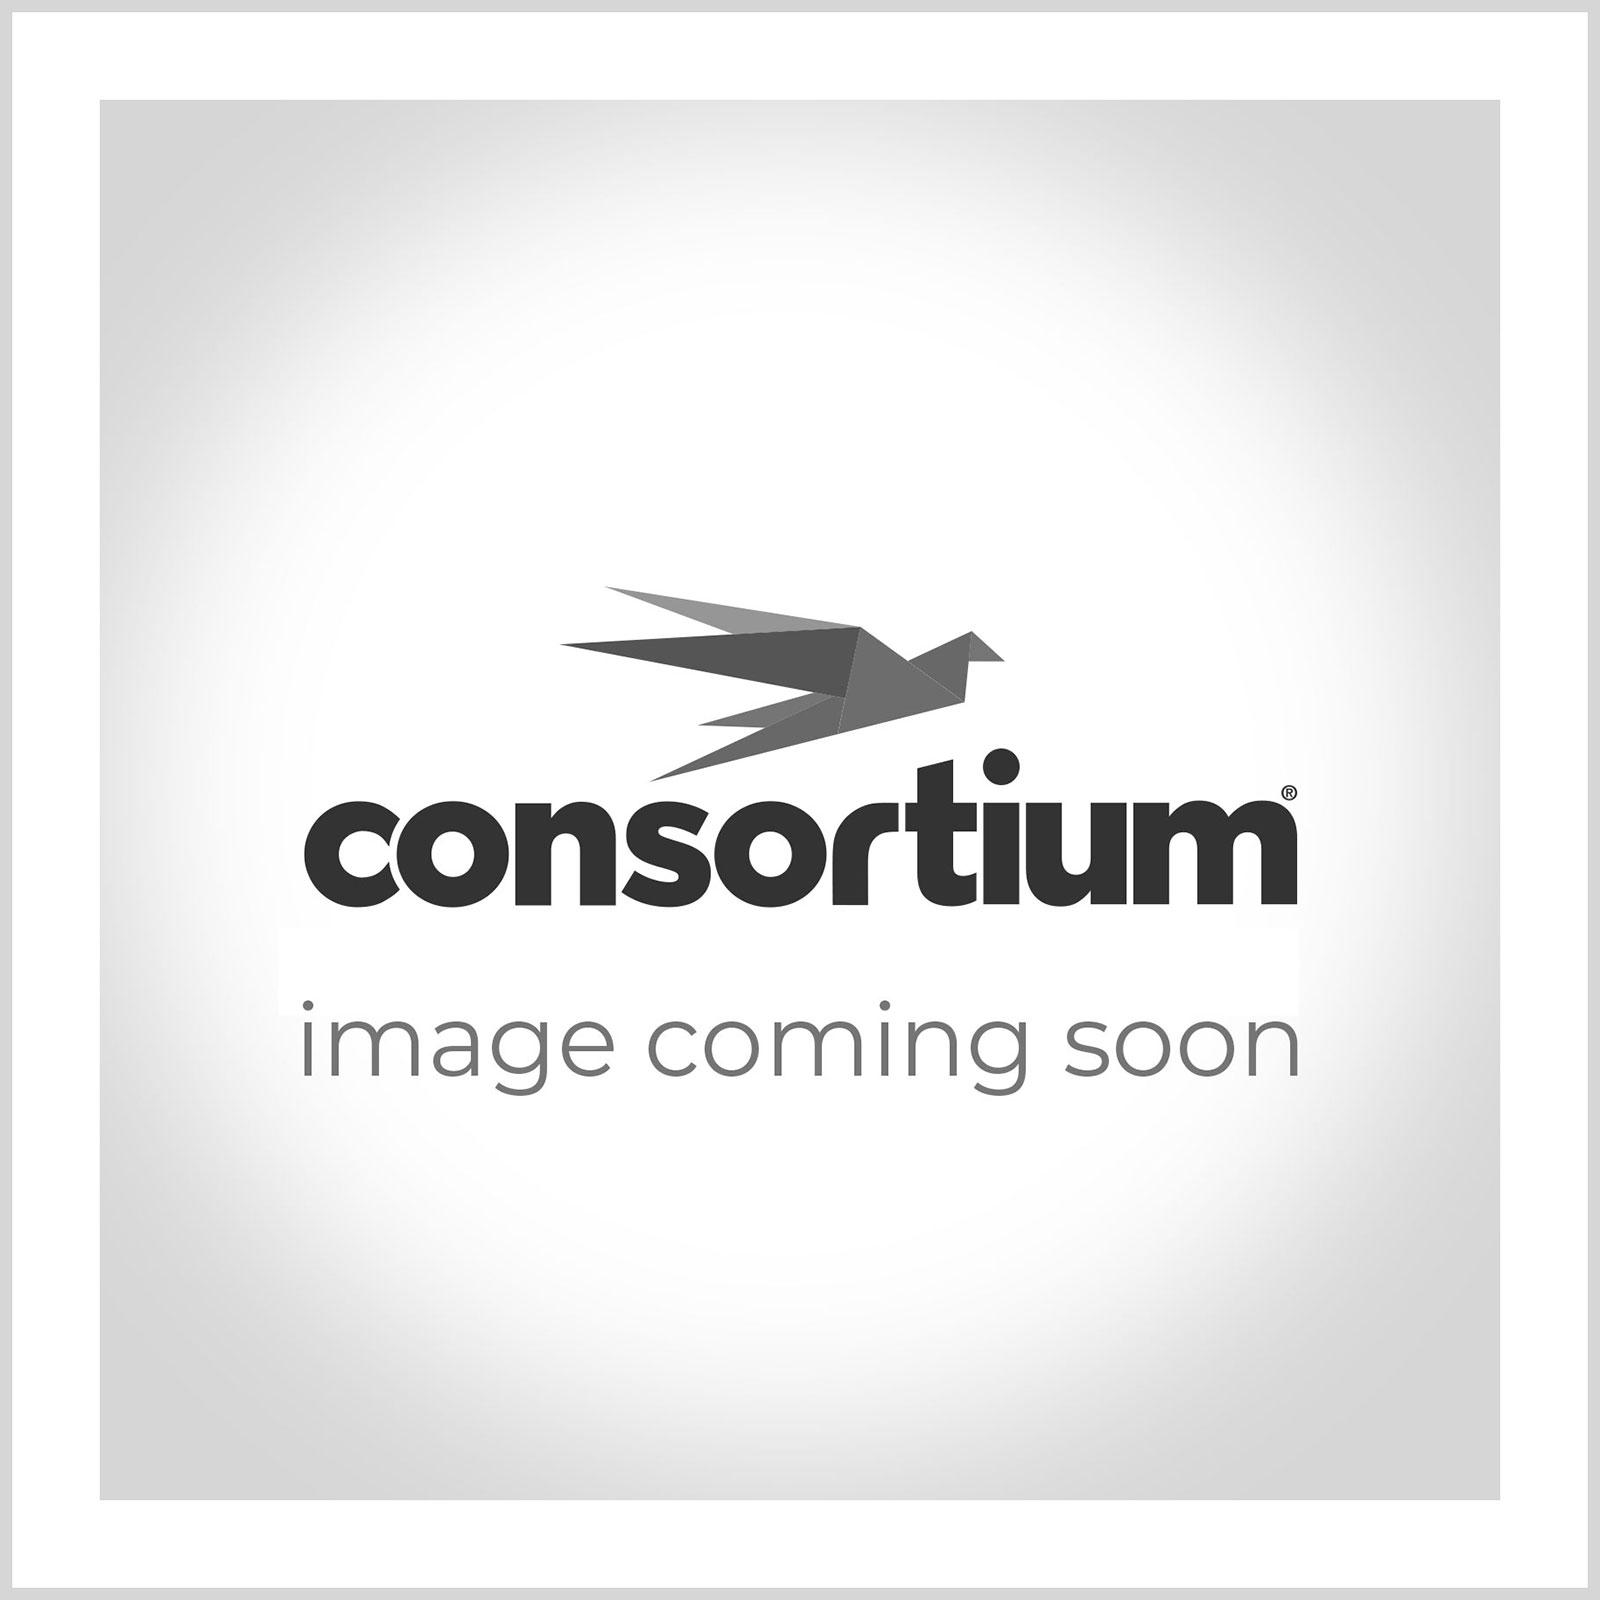 Evo-Stik Wood Adhesive